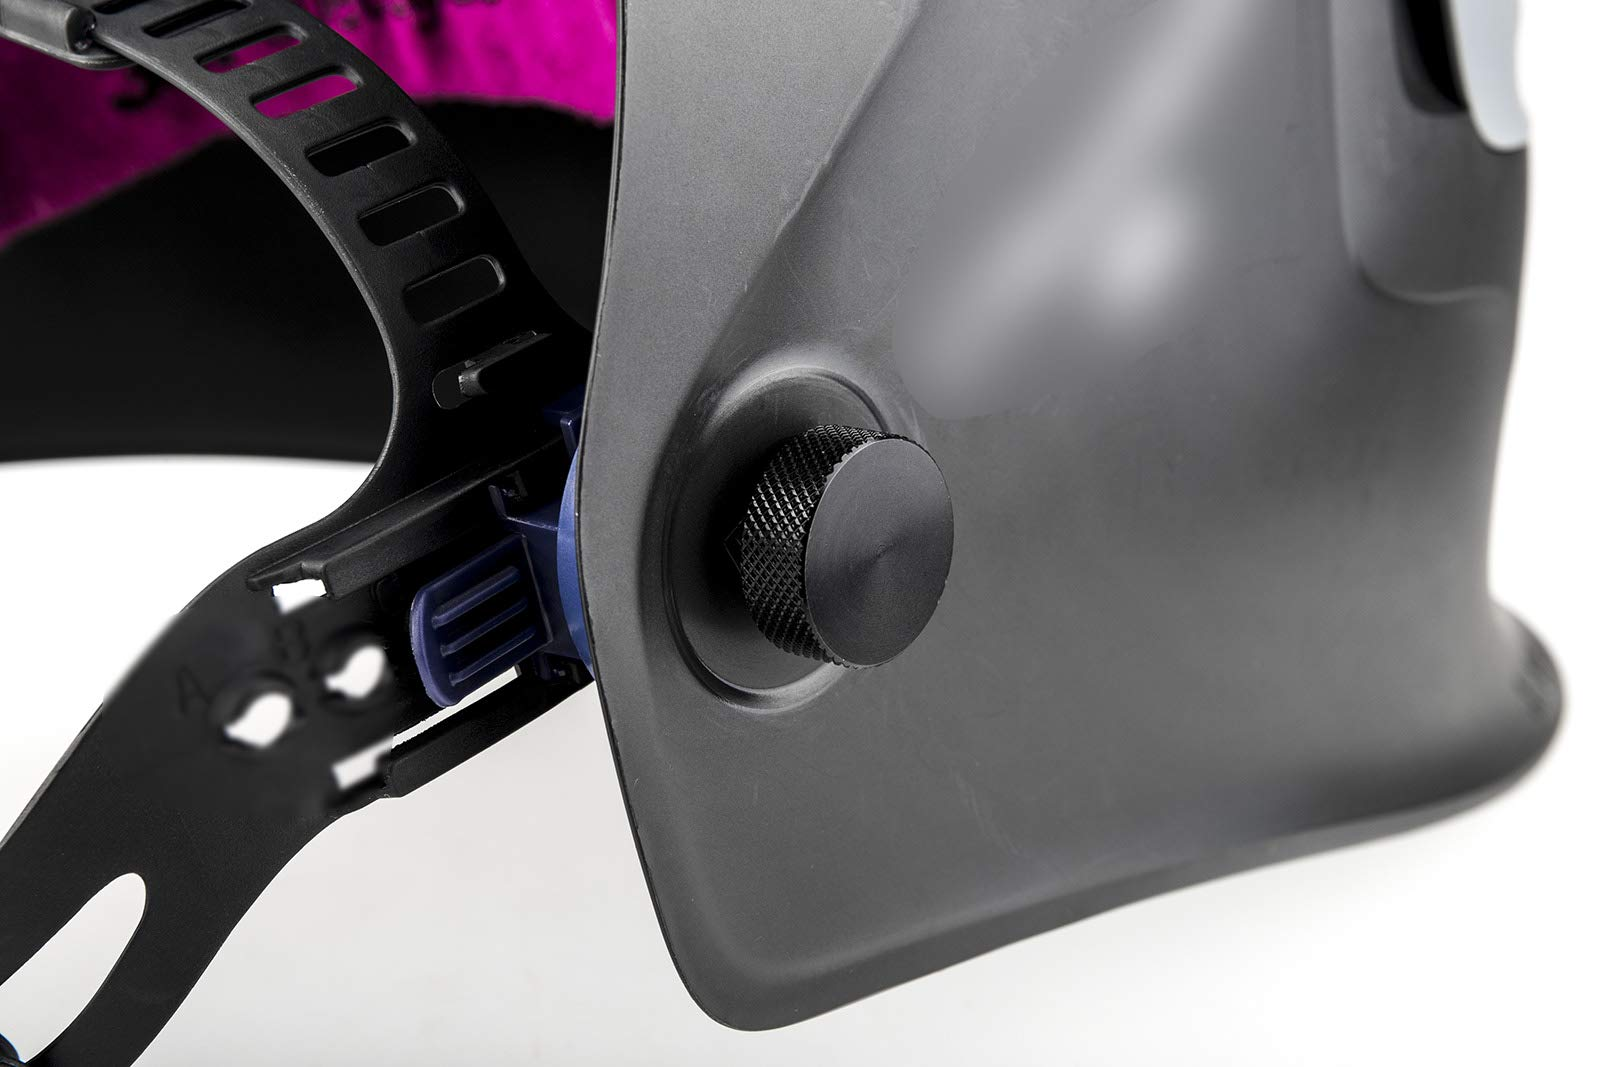 3mirrors Welding Hood (Pipeliner) Helmet Fasteners Aluminum - 1 Pair (Black Anodized Knurled) by 3mirrors (Image #3)